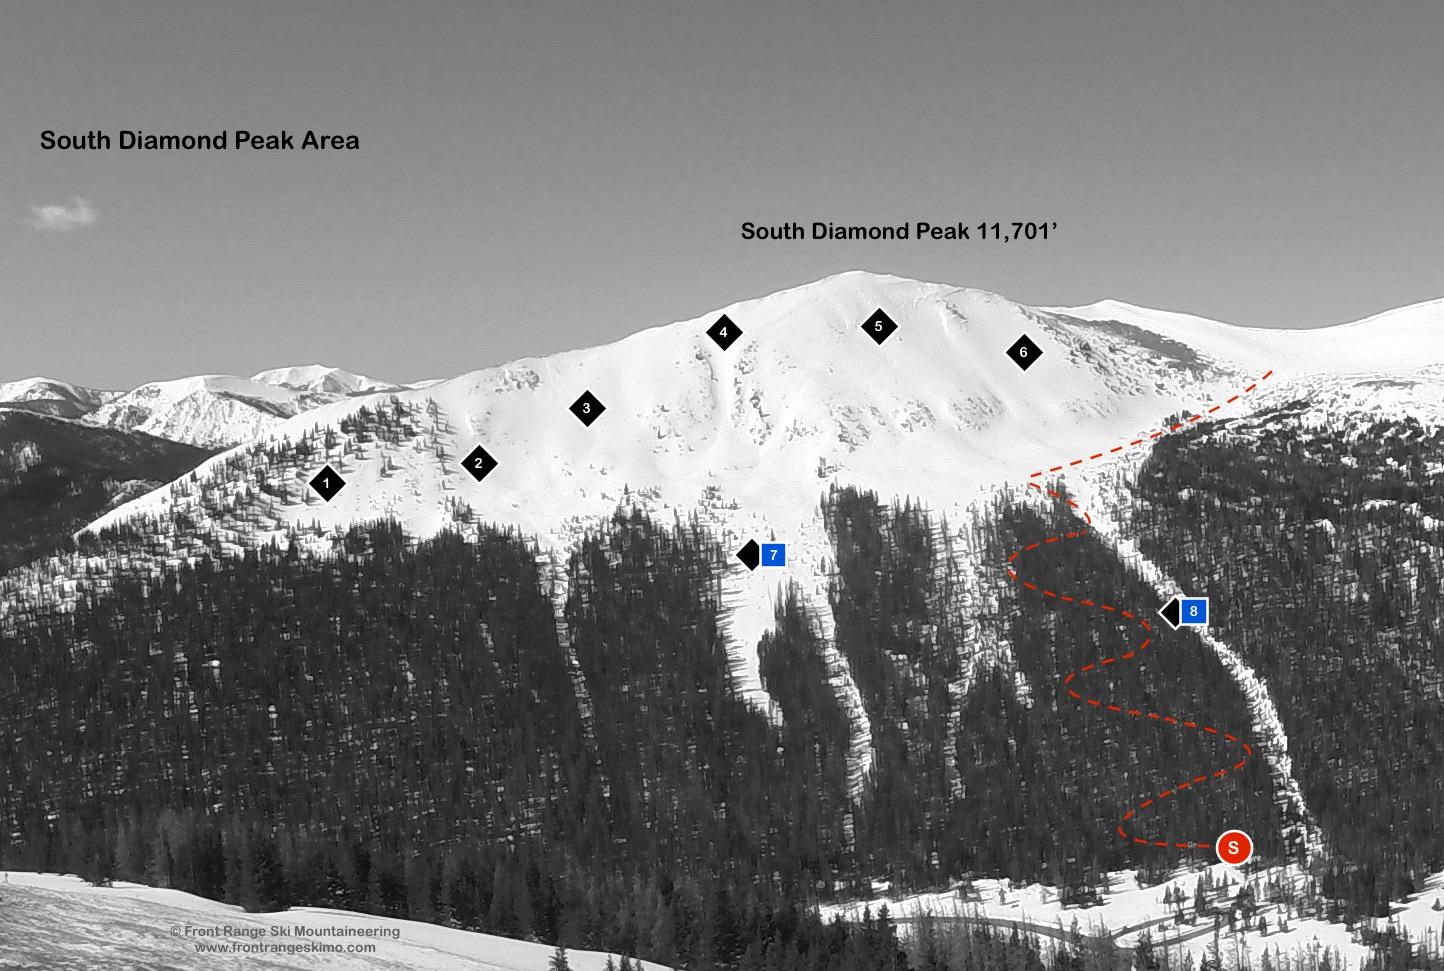 South Diamond Peak from the East. Photo: Rob Writz